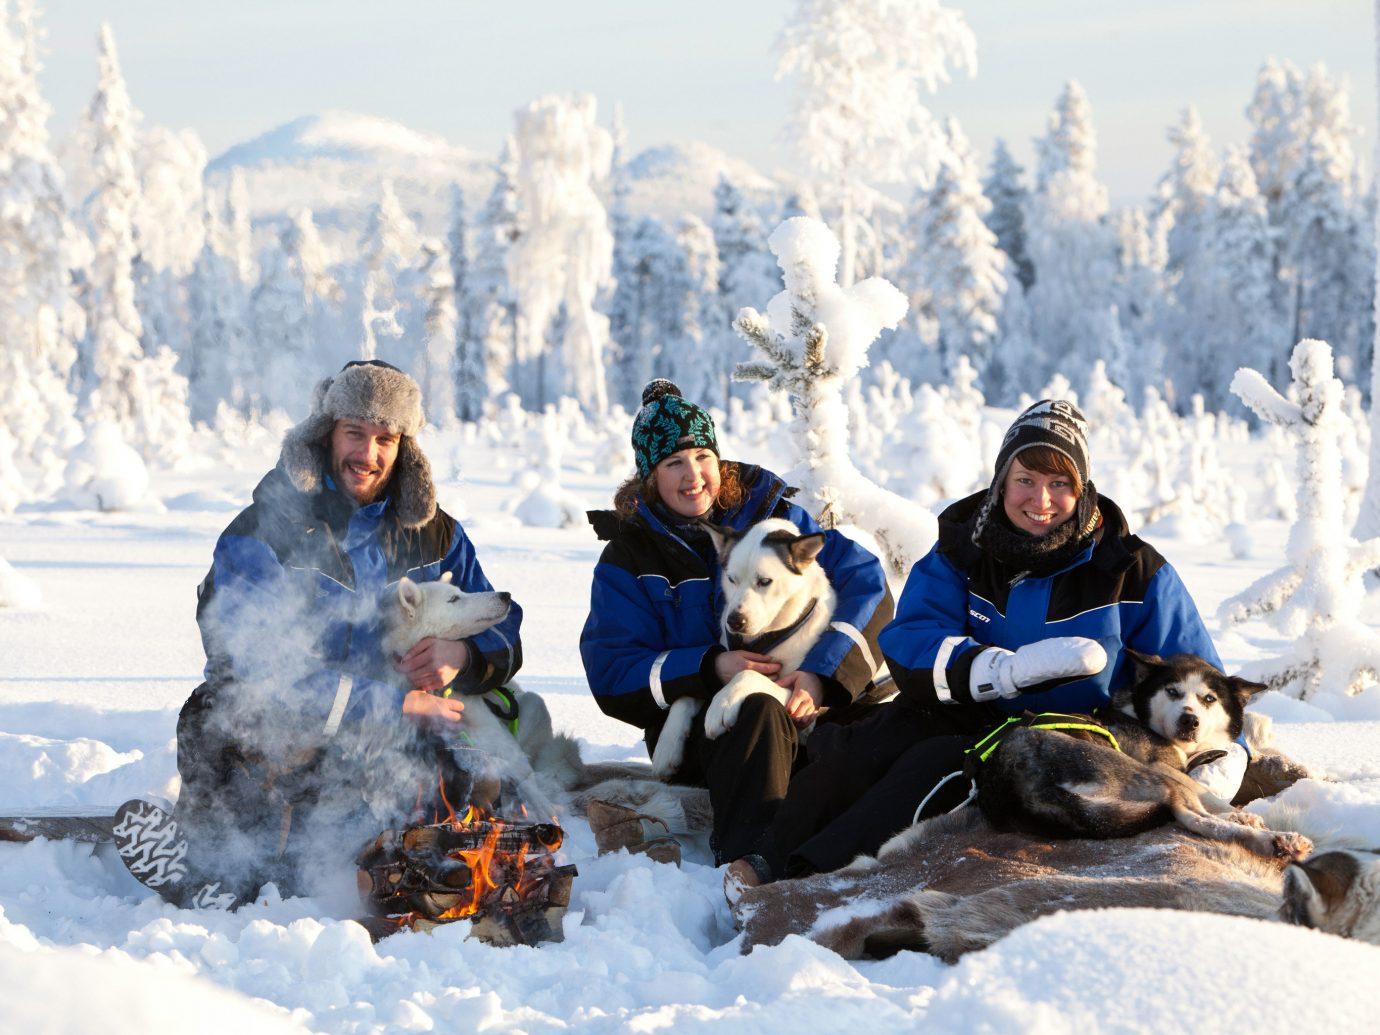 Trip Ideas snow outdoor Dog person Winter transport vehicle season people footwear sled winter sport sledding snowshoe posing